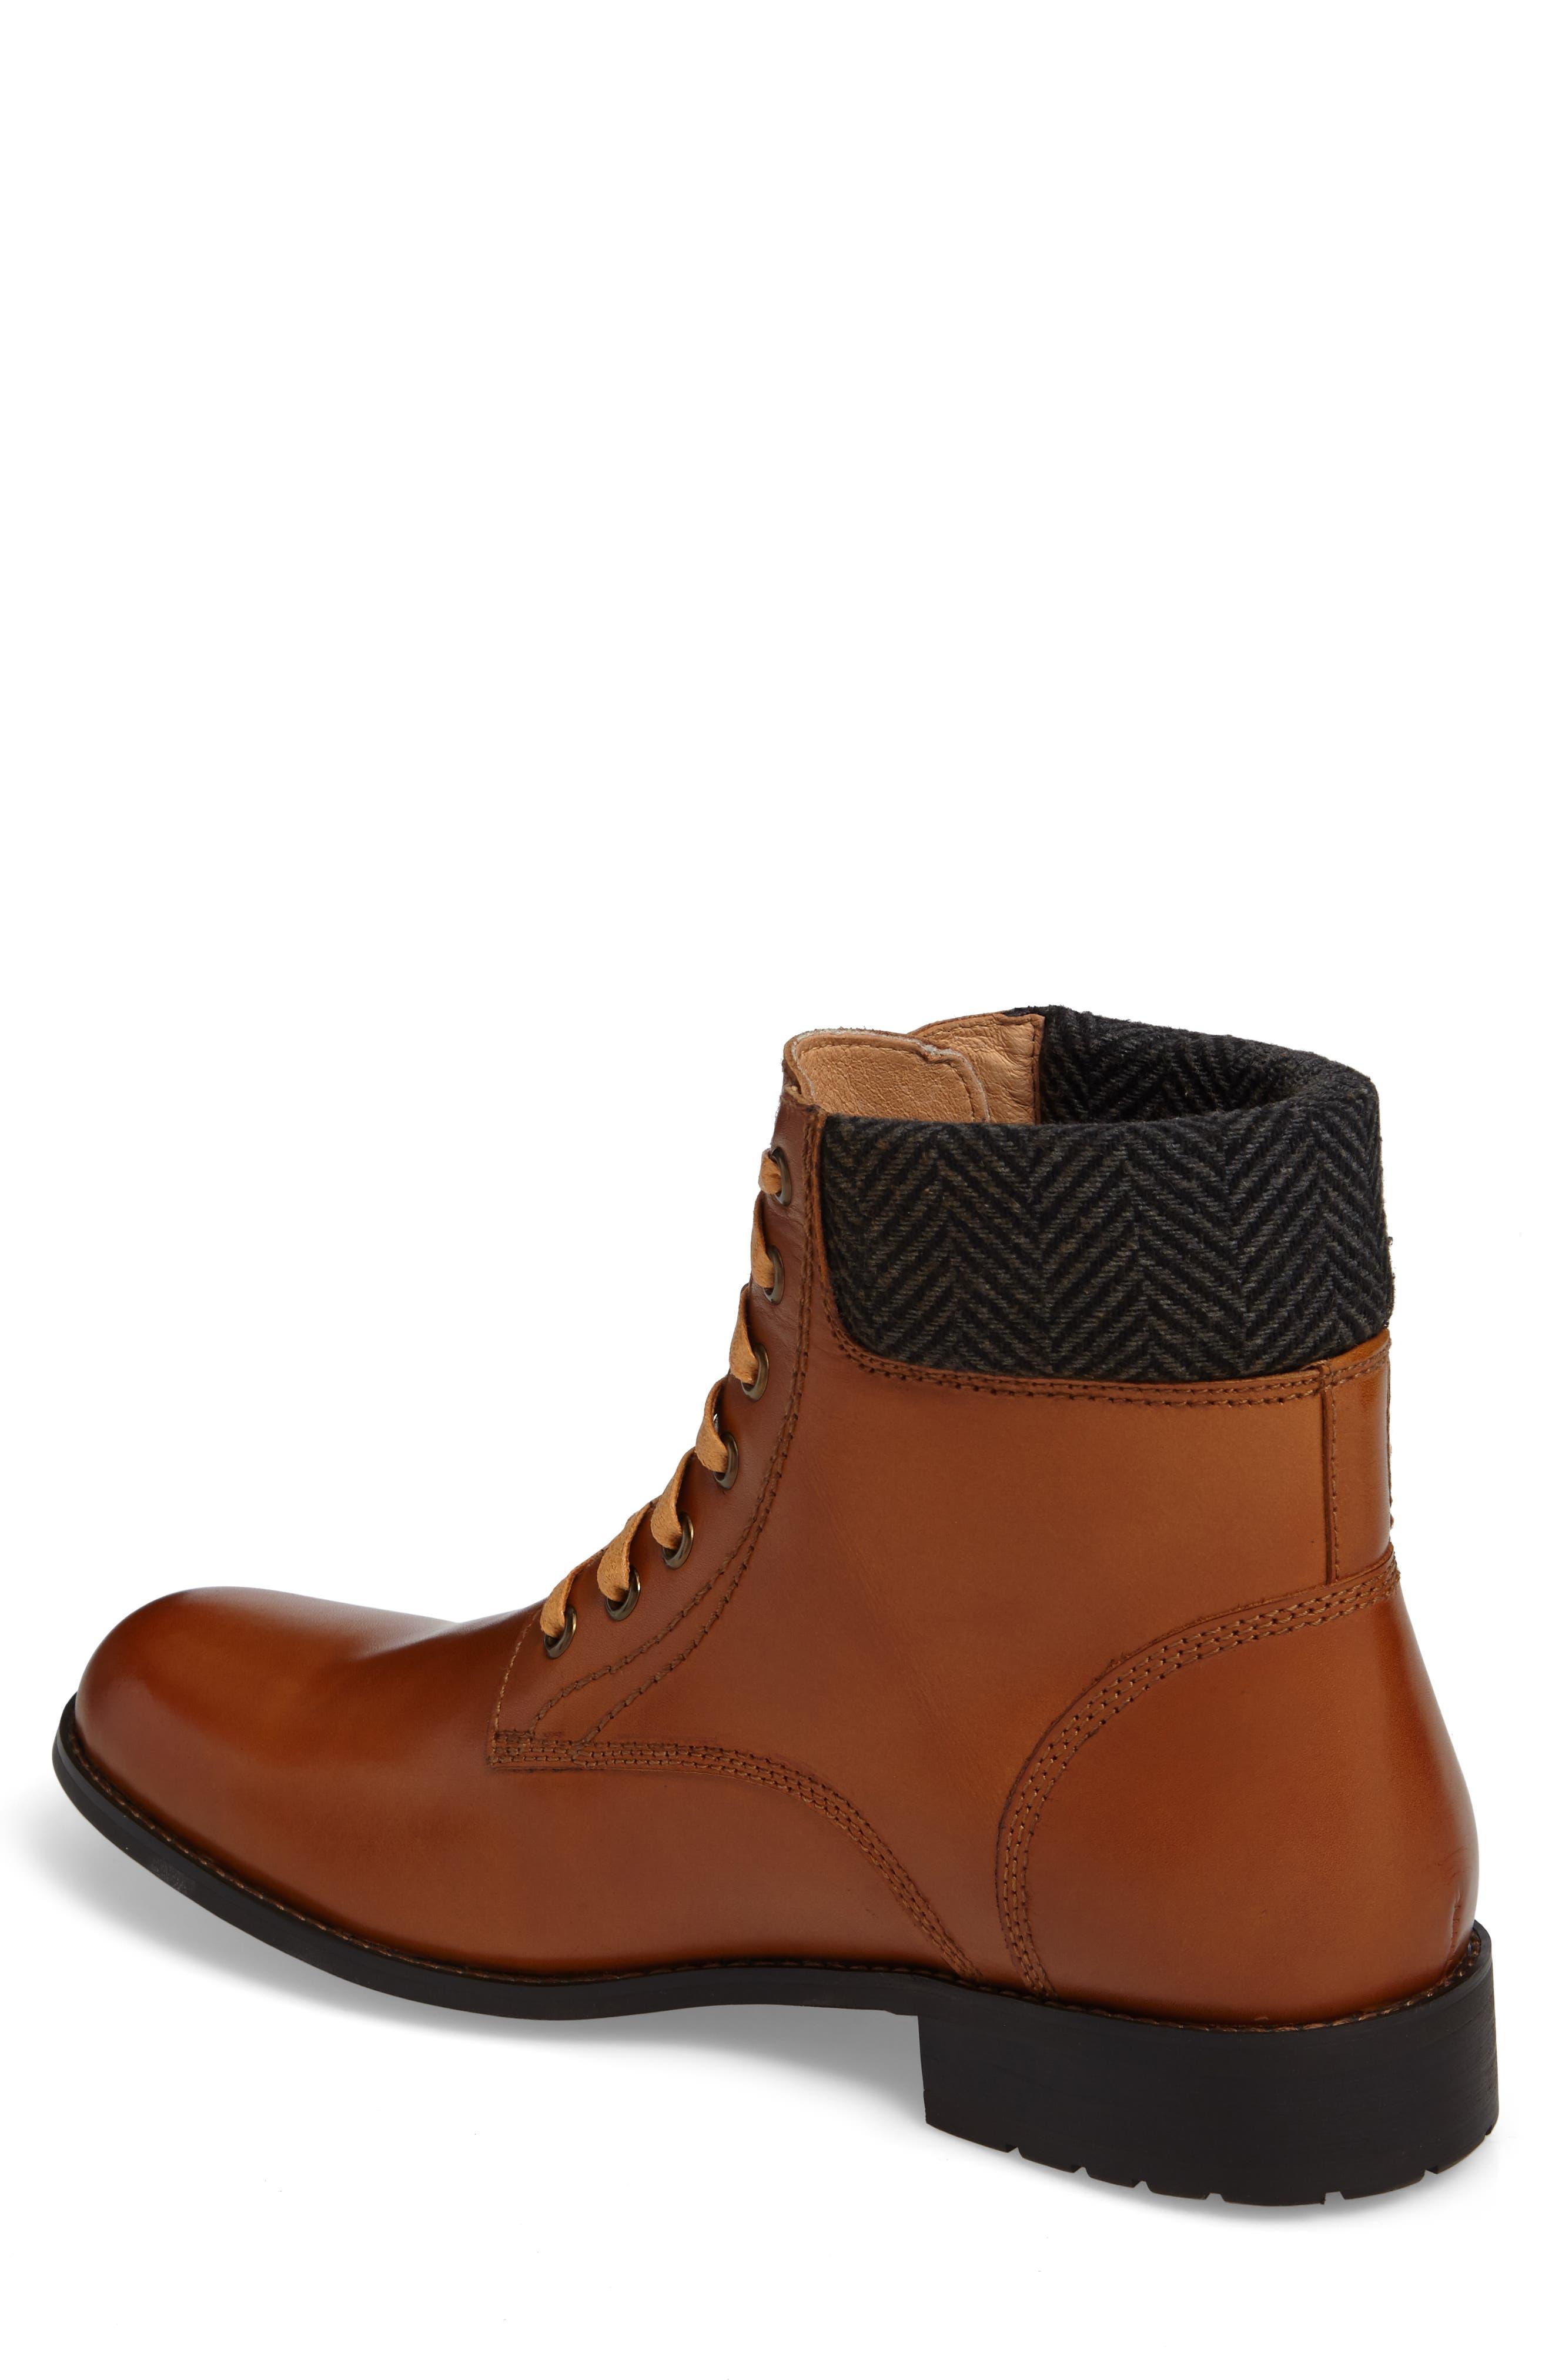 Saar Plain Toe Boot,                             Alternate thumbnail 2, color,                             Cognac Leather